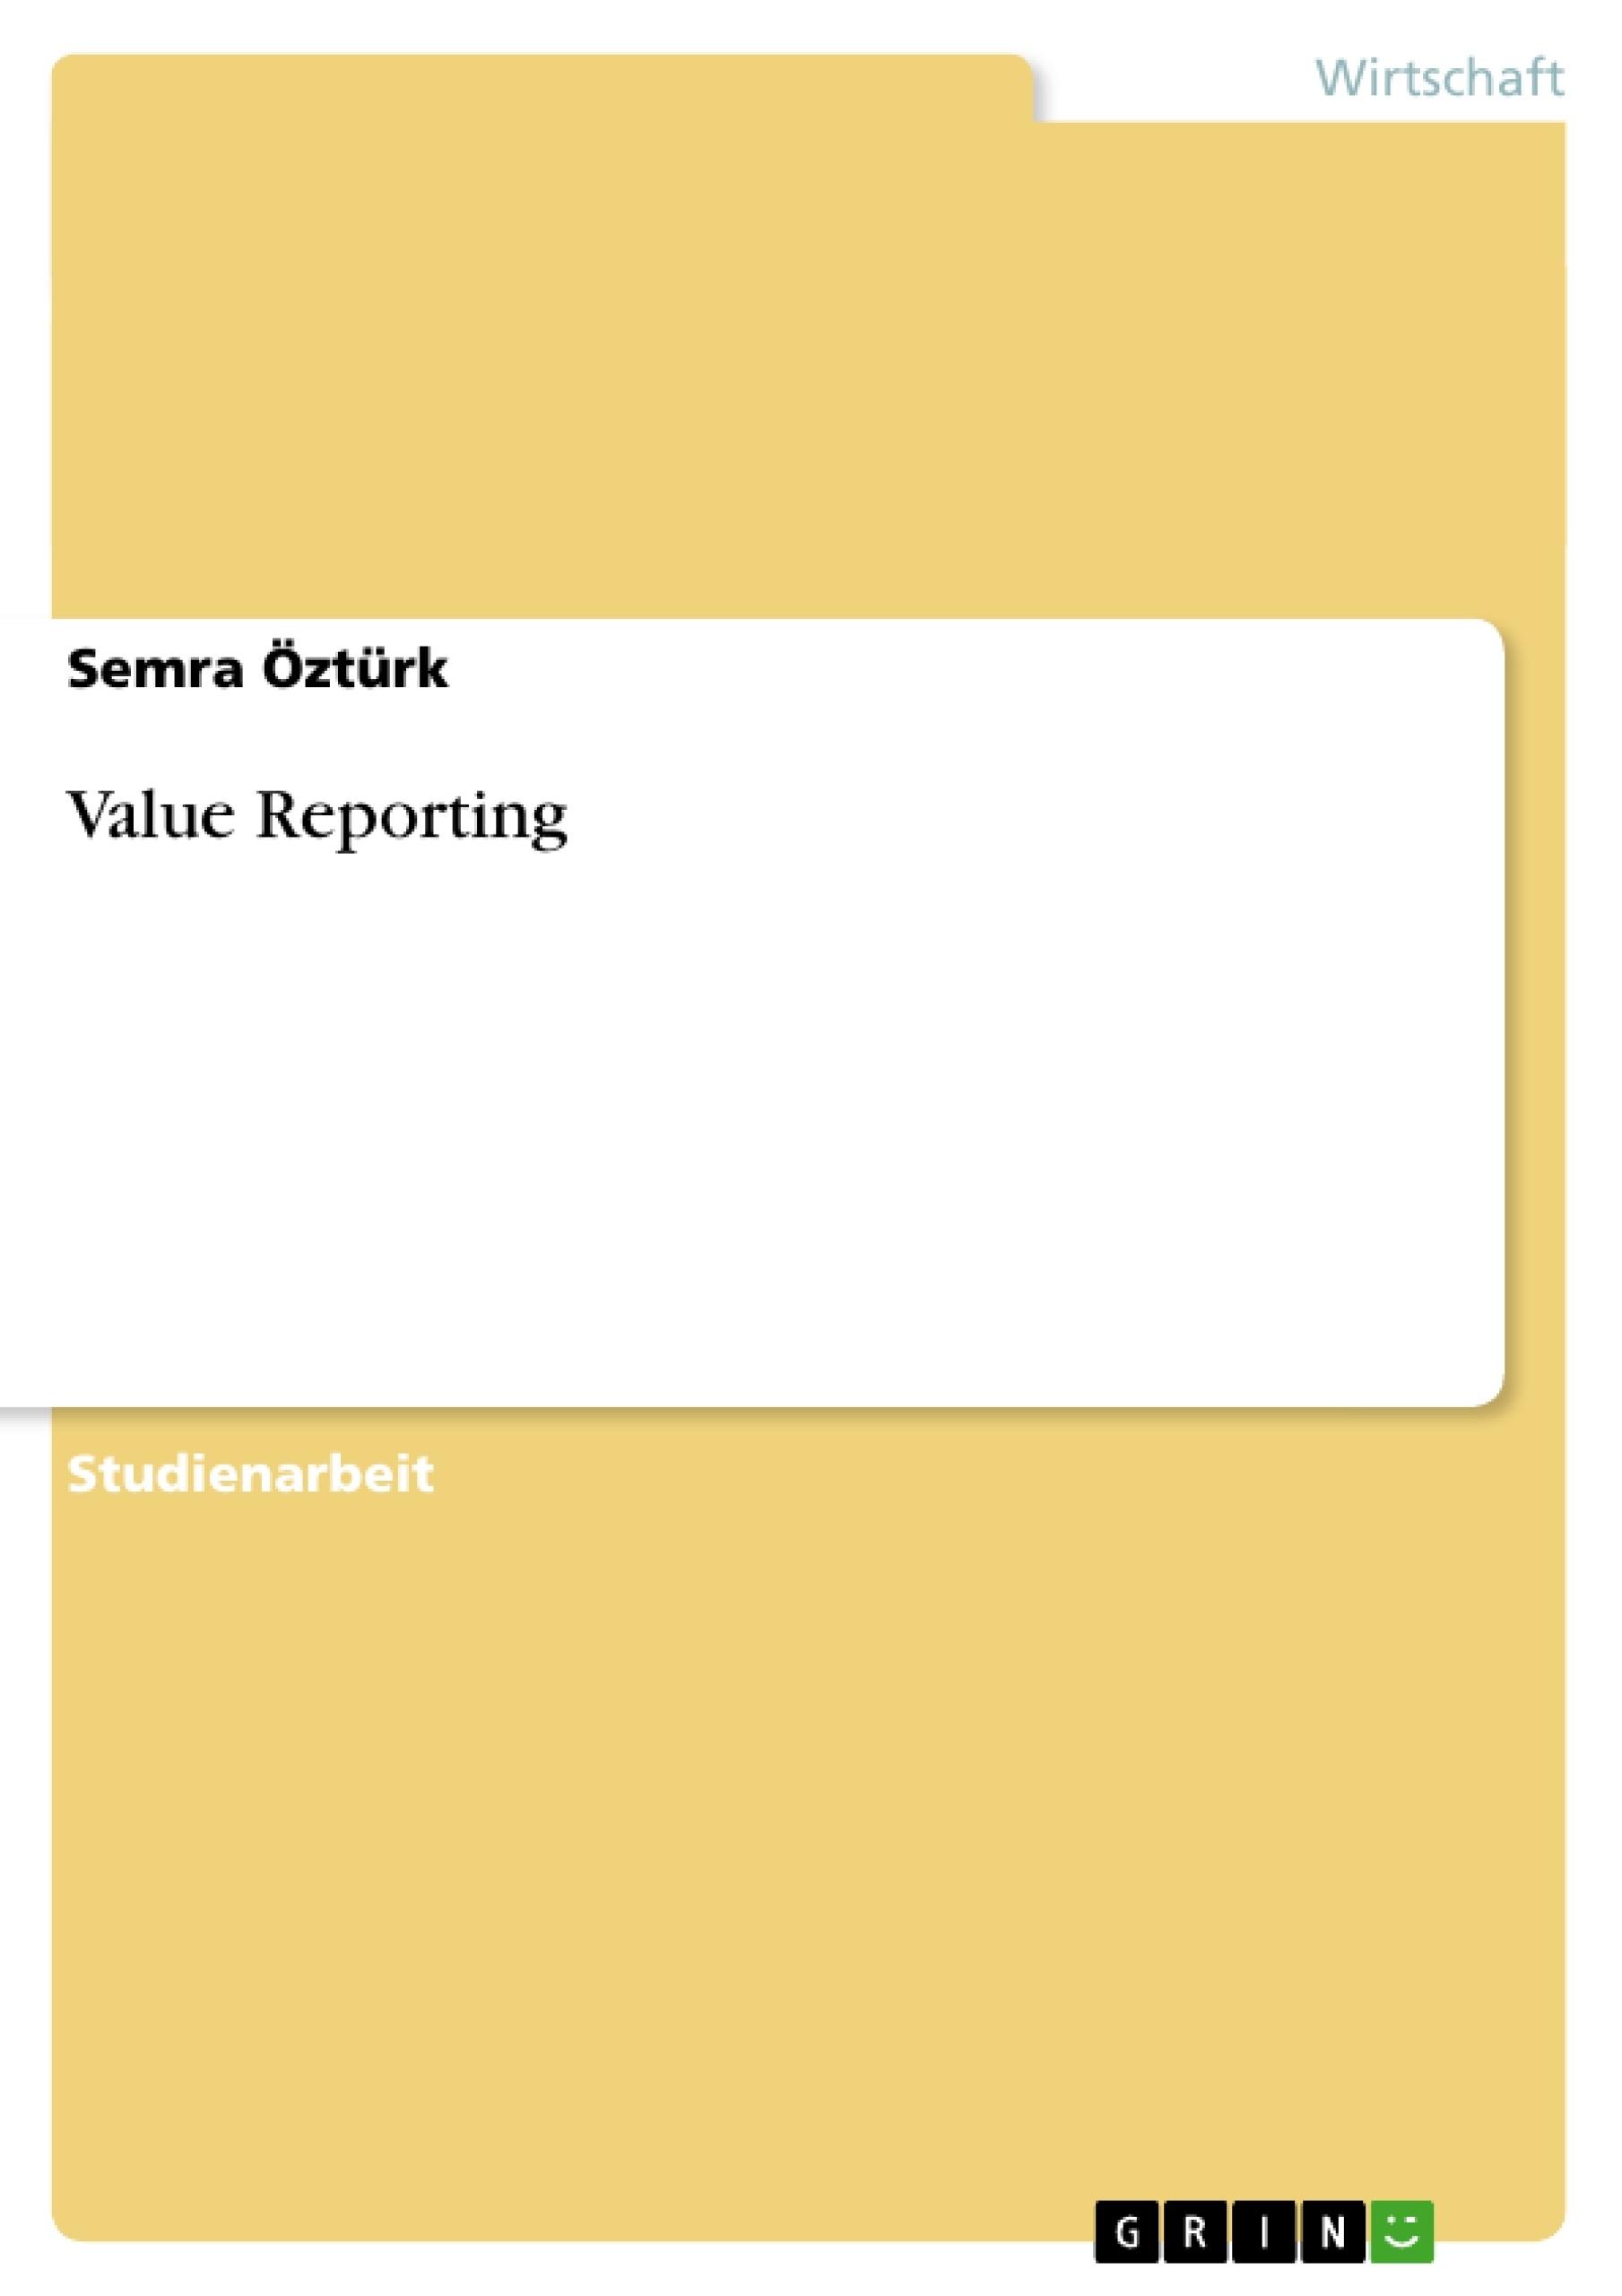 Titel: Value Reporting